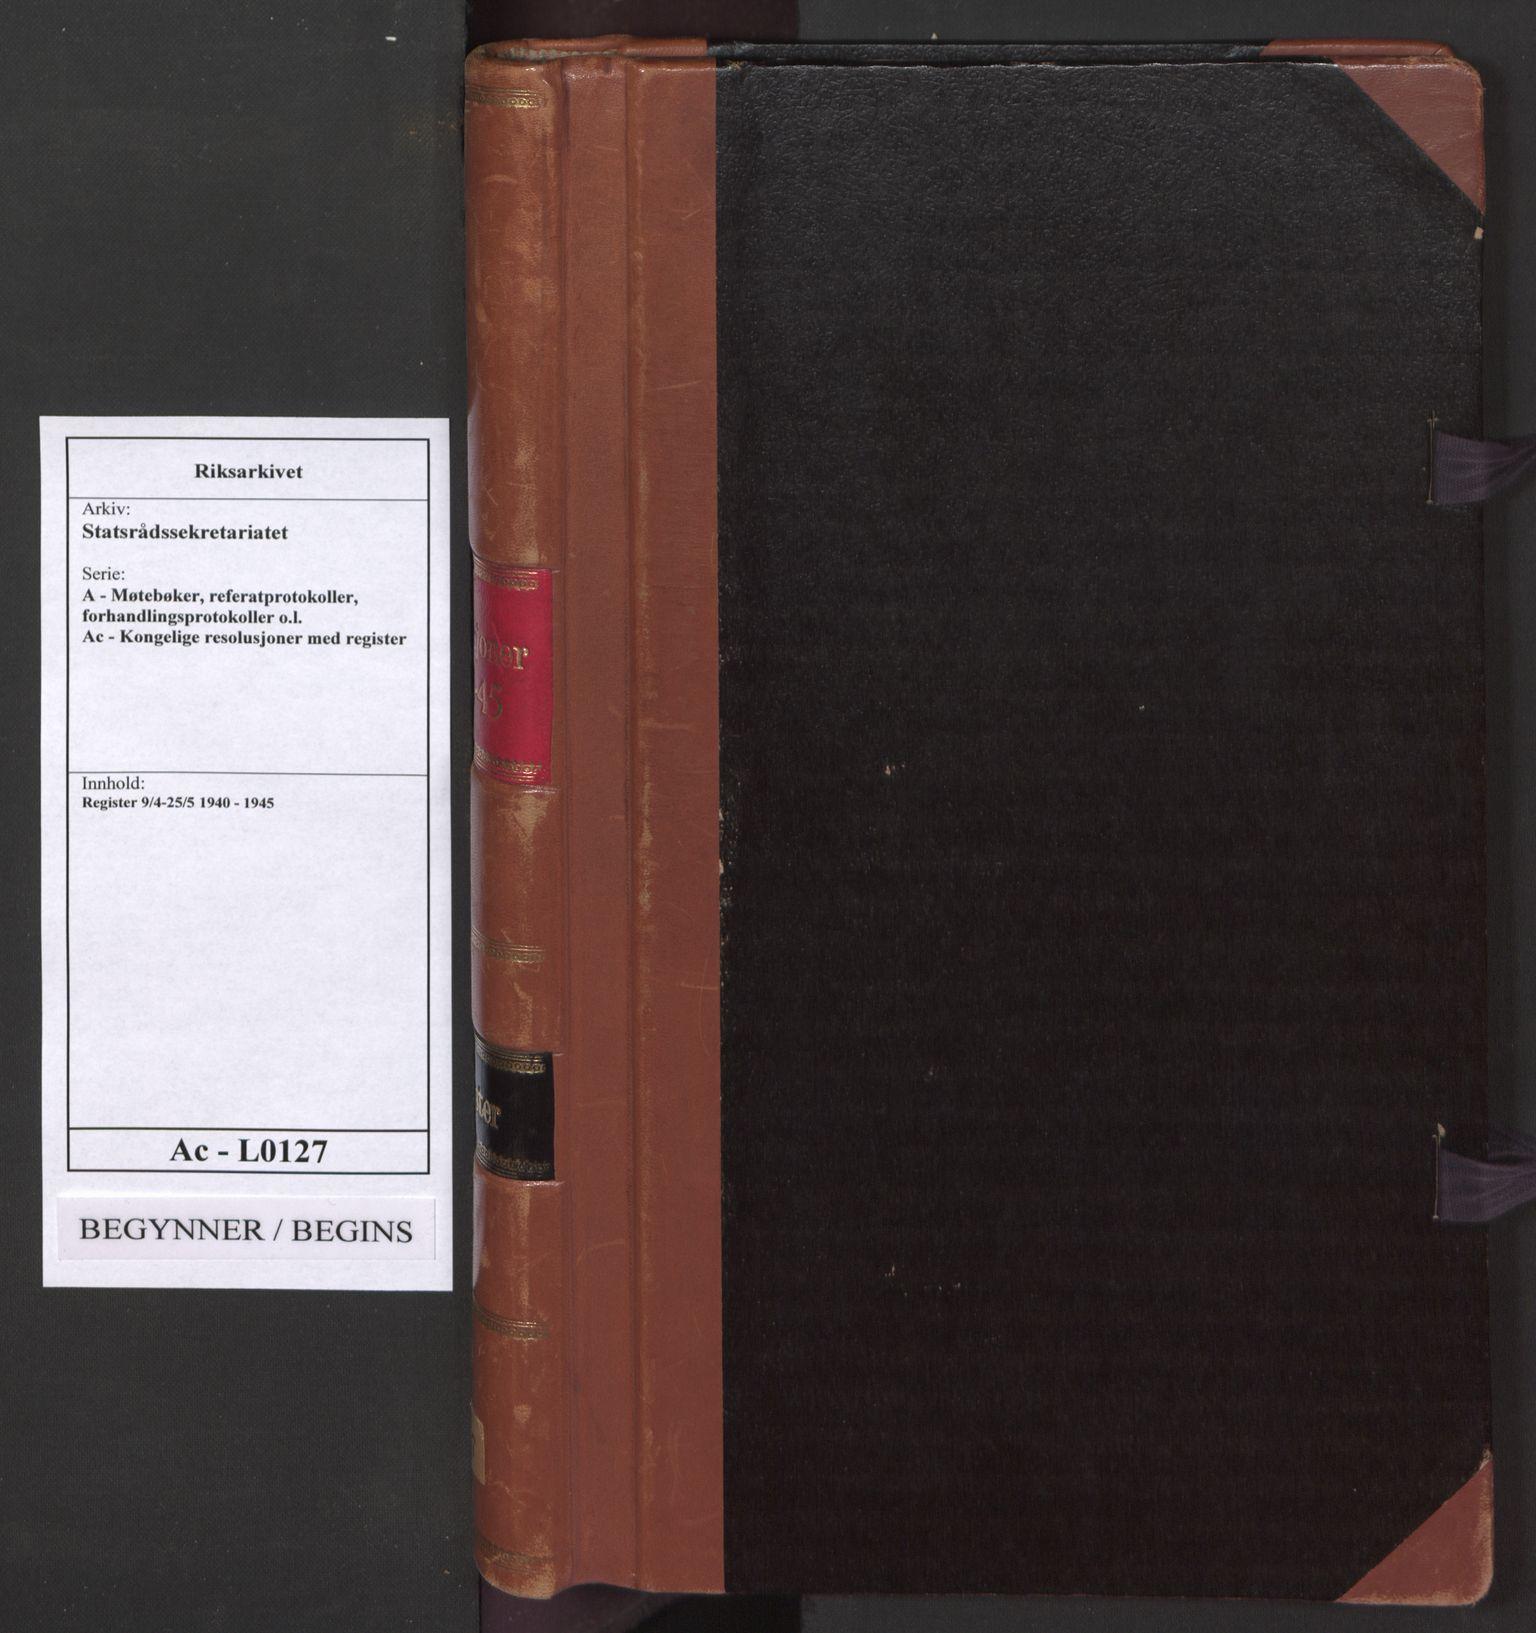 RA, Statsrådssekretariatet, A/Ac/L0127: Register 9/4-25/5, 1940-1945, s. upaginert